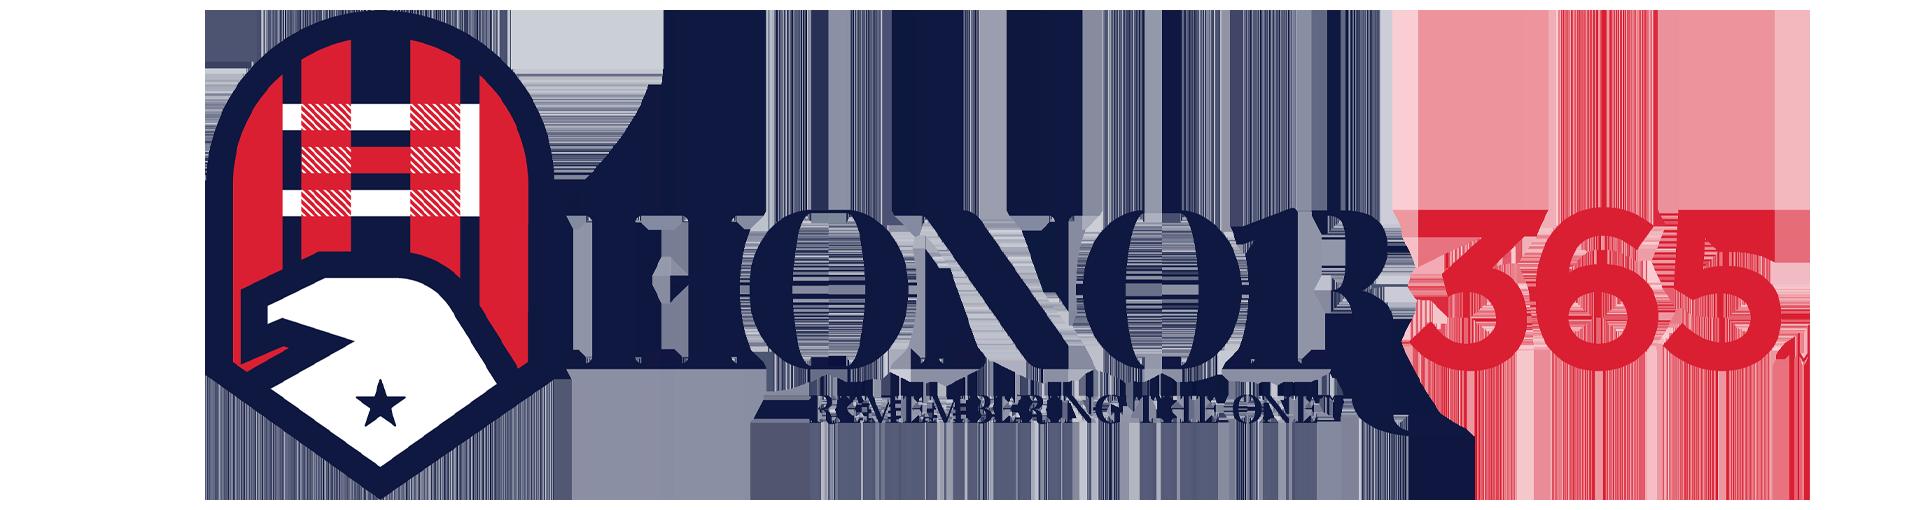 Honor365